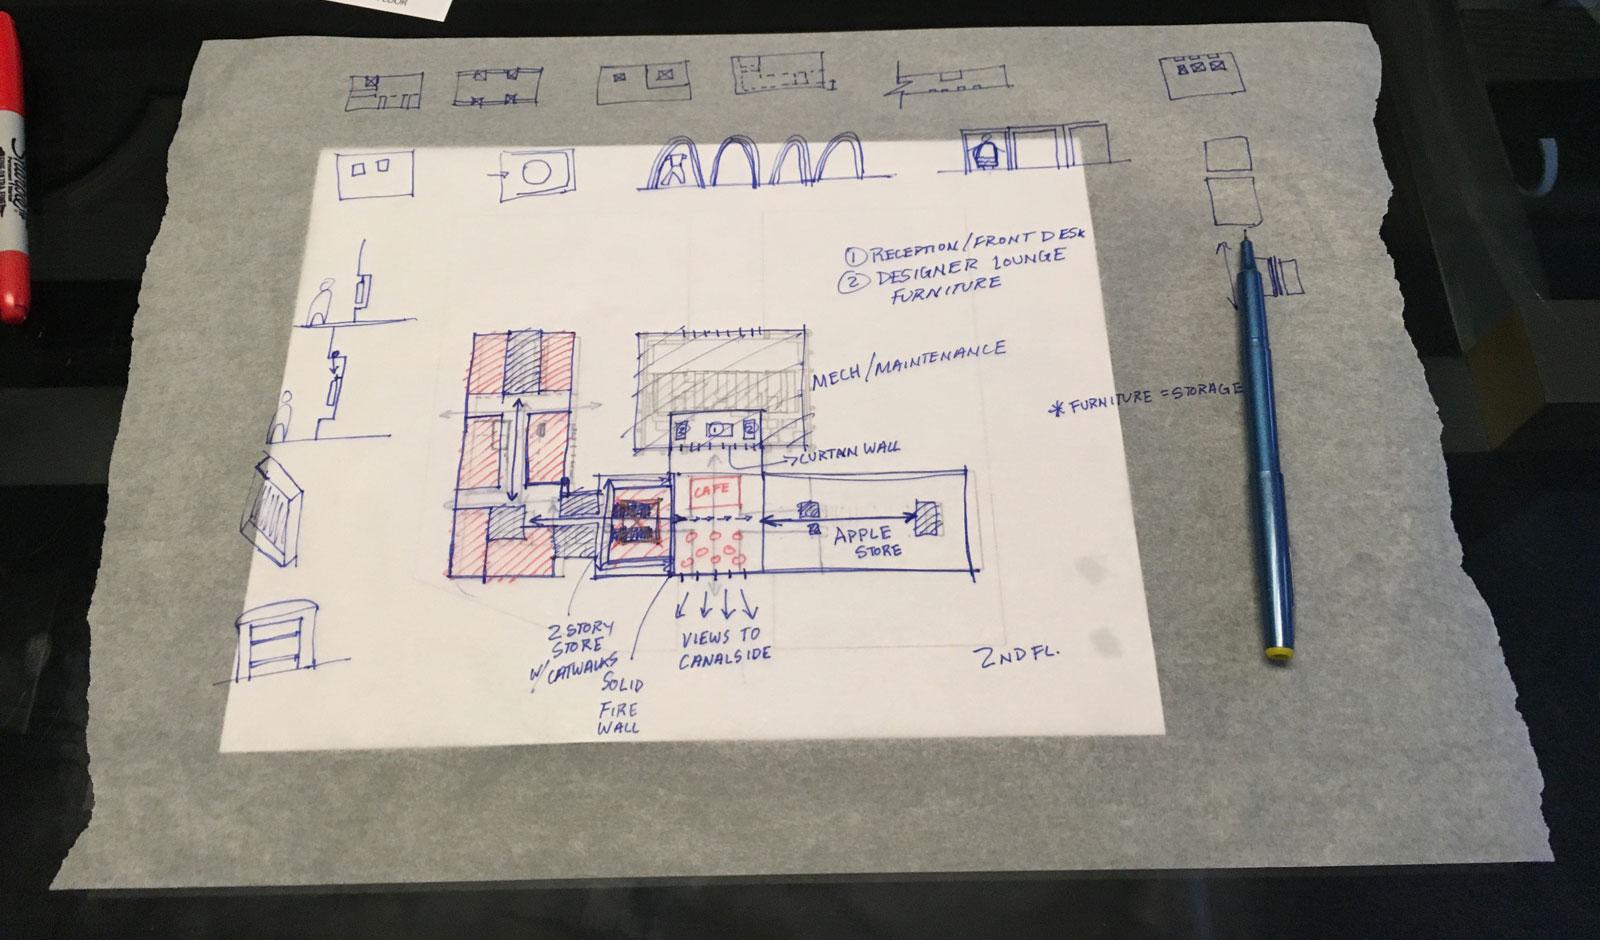 3x30 - One Seneca Tower Design Charrette Sketches